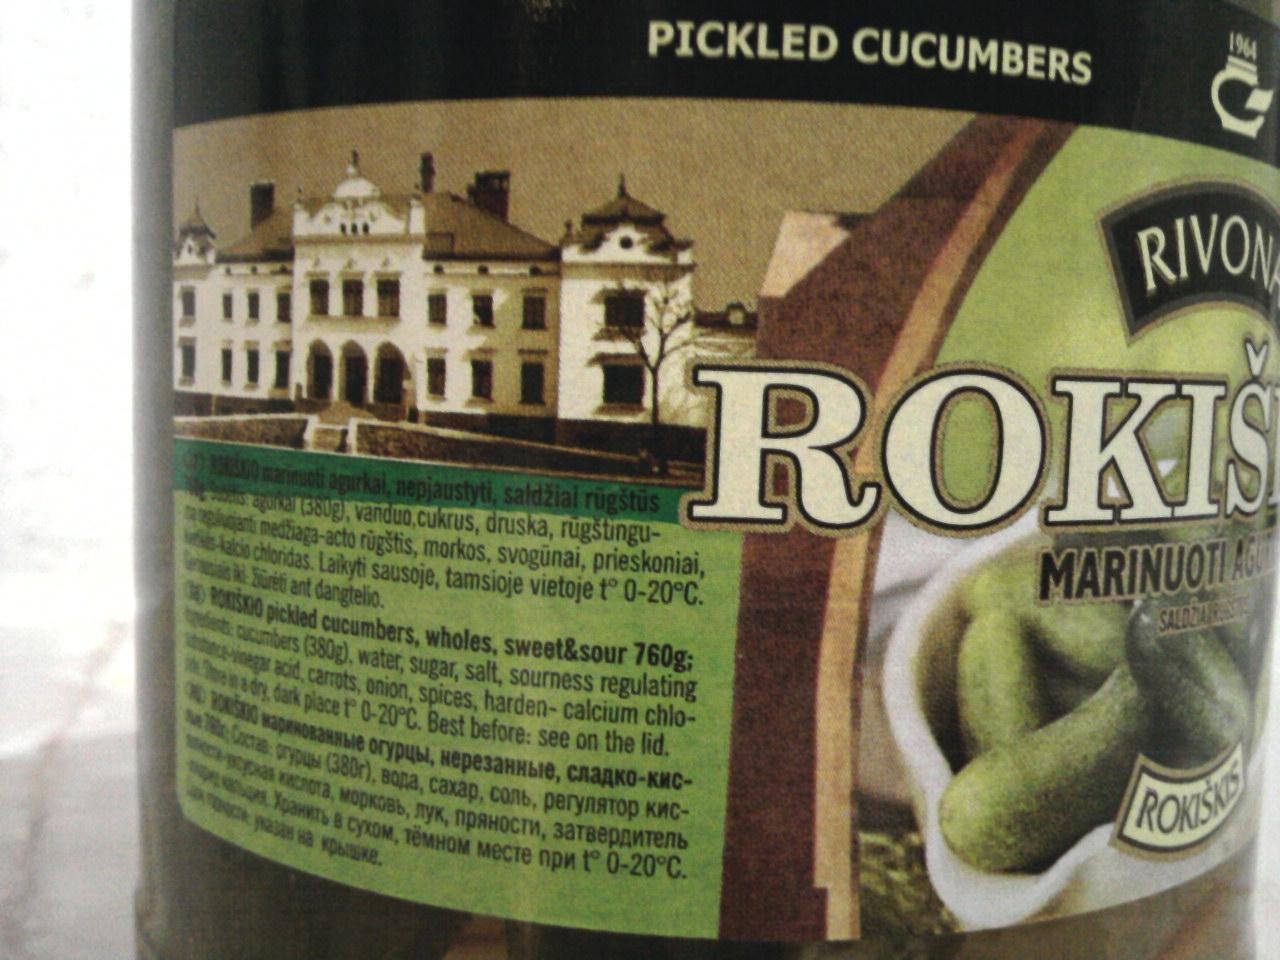 Rivona Rokiškio Marinuoti Agurkai Pickled Cucumbers ingredients side of label